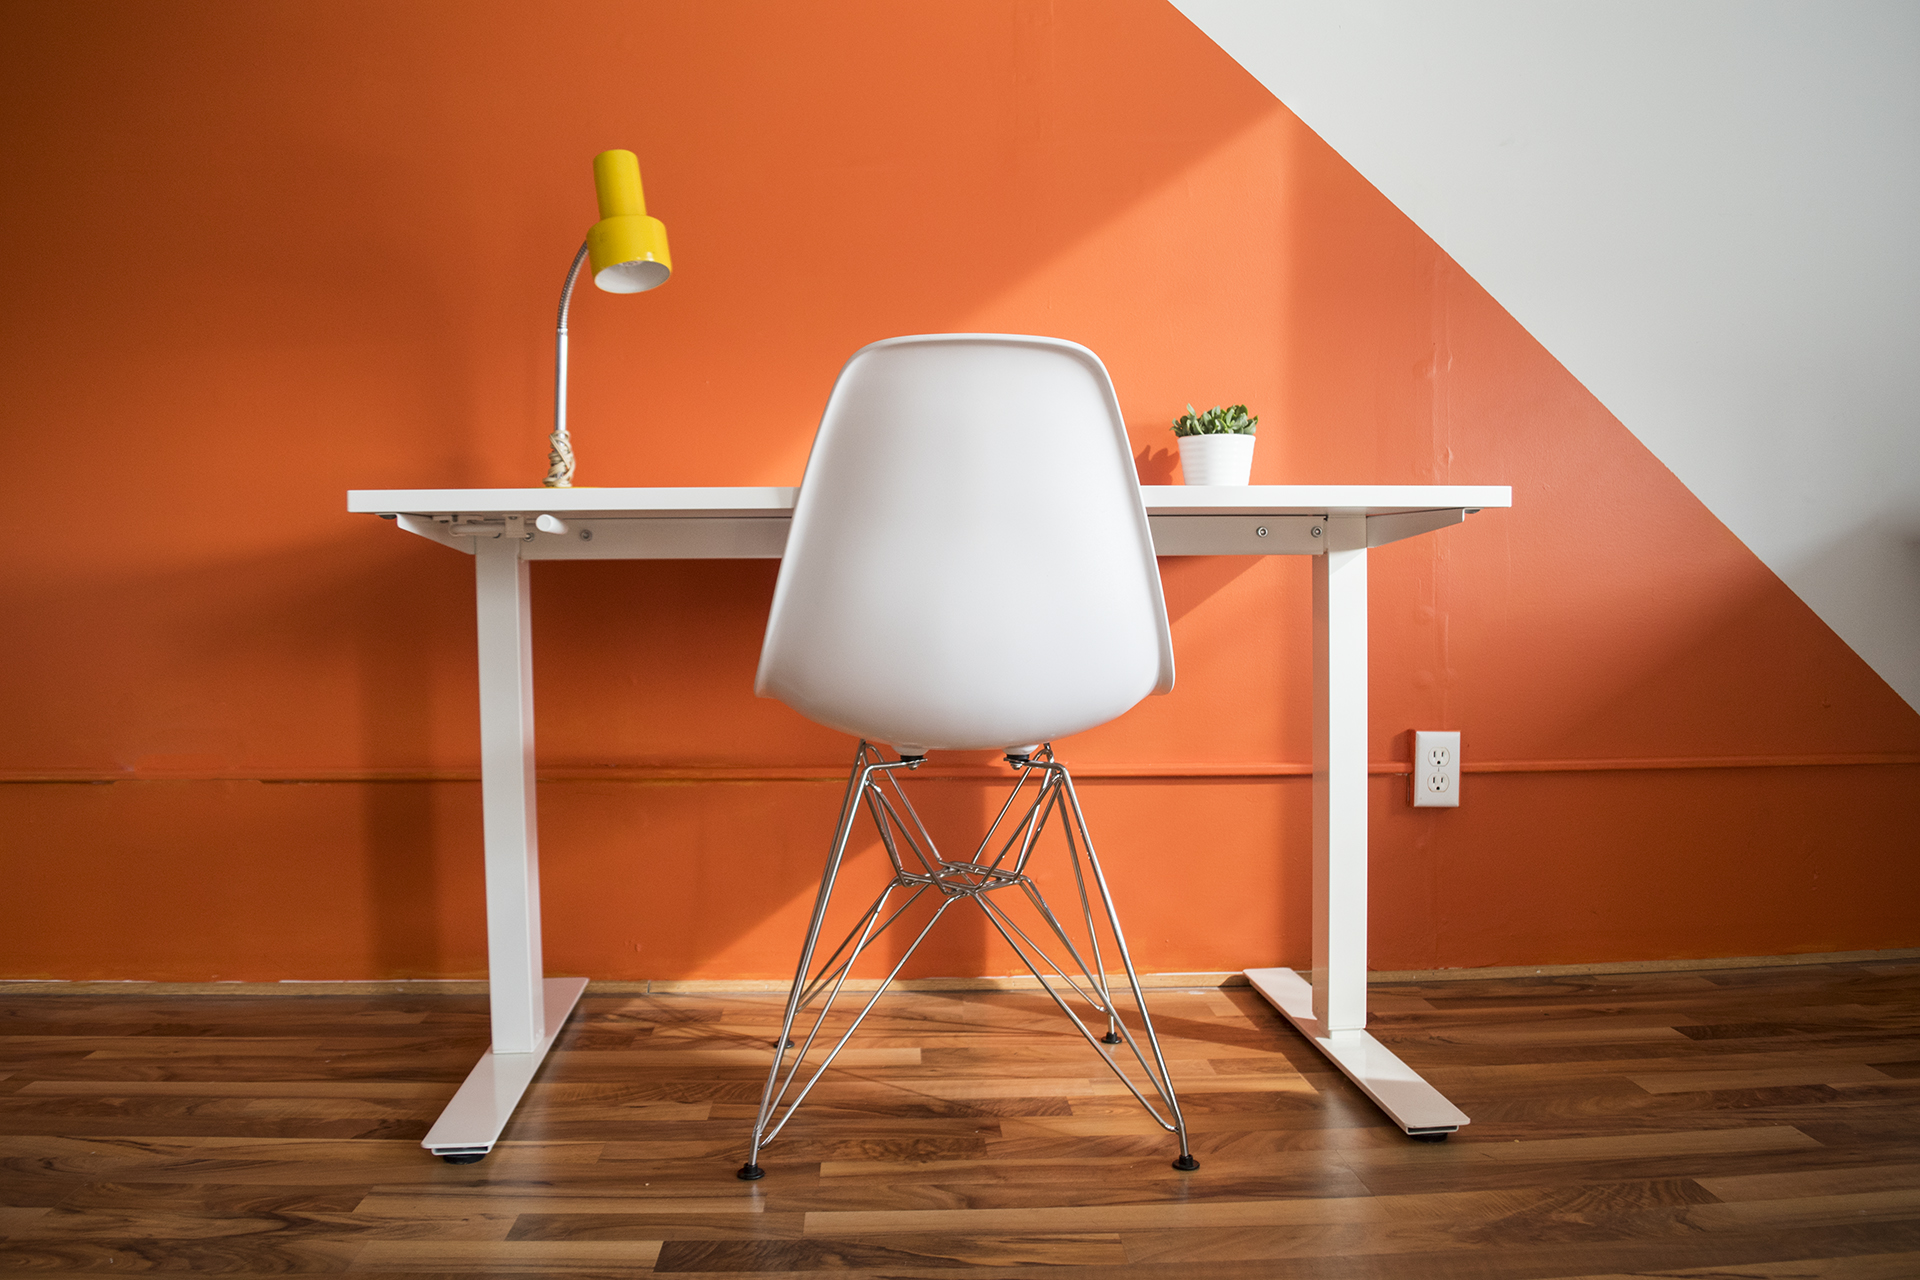 Dedicated-Desks-1.jpg